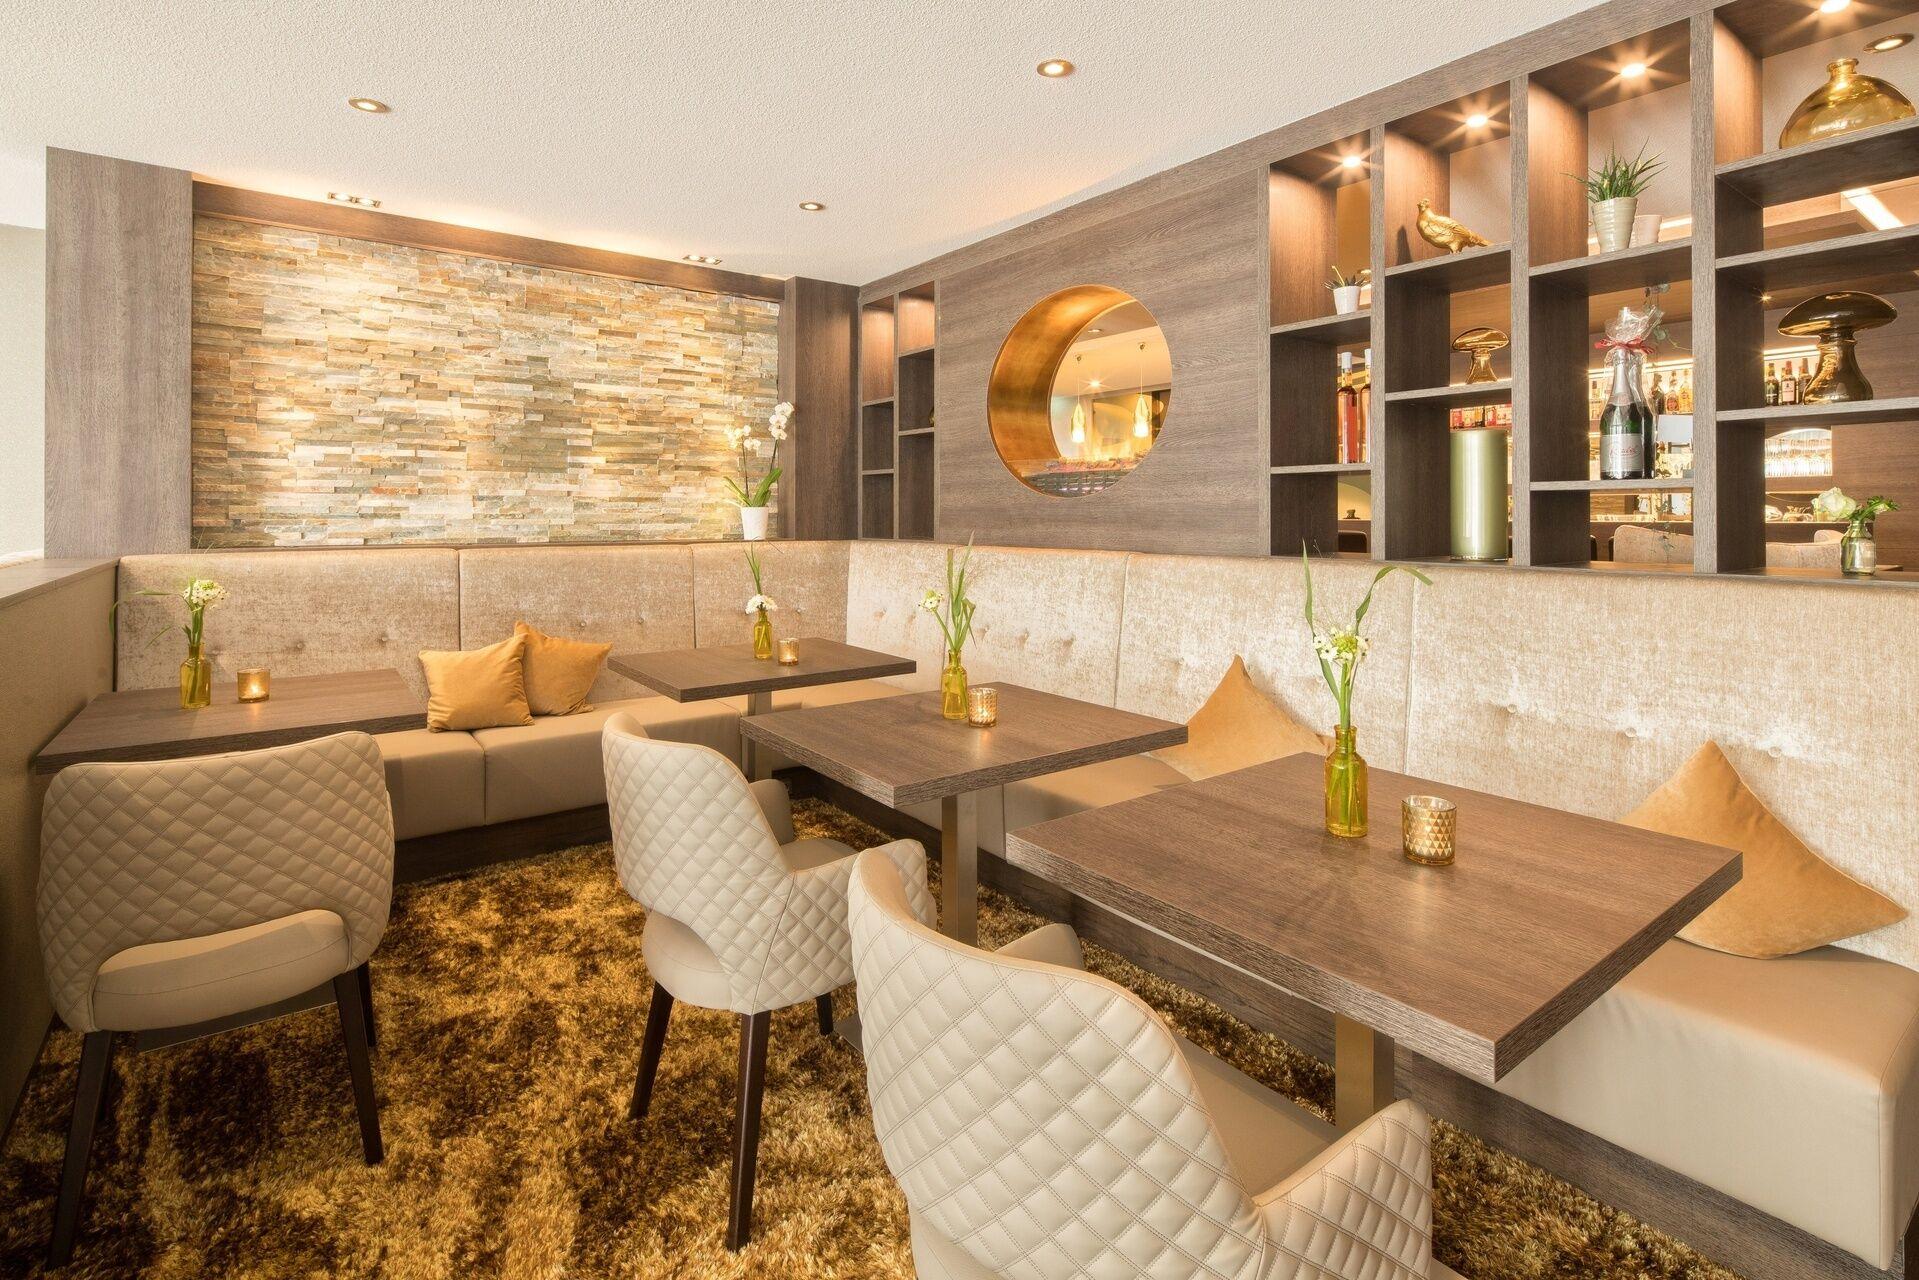 restaurant n rnberg zirndorf hotel restaurants mittelfranken bayern. Black Bedroom Furniture Sets. Home Design Ideas